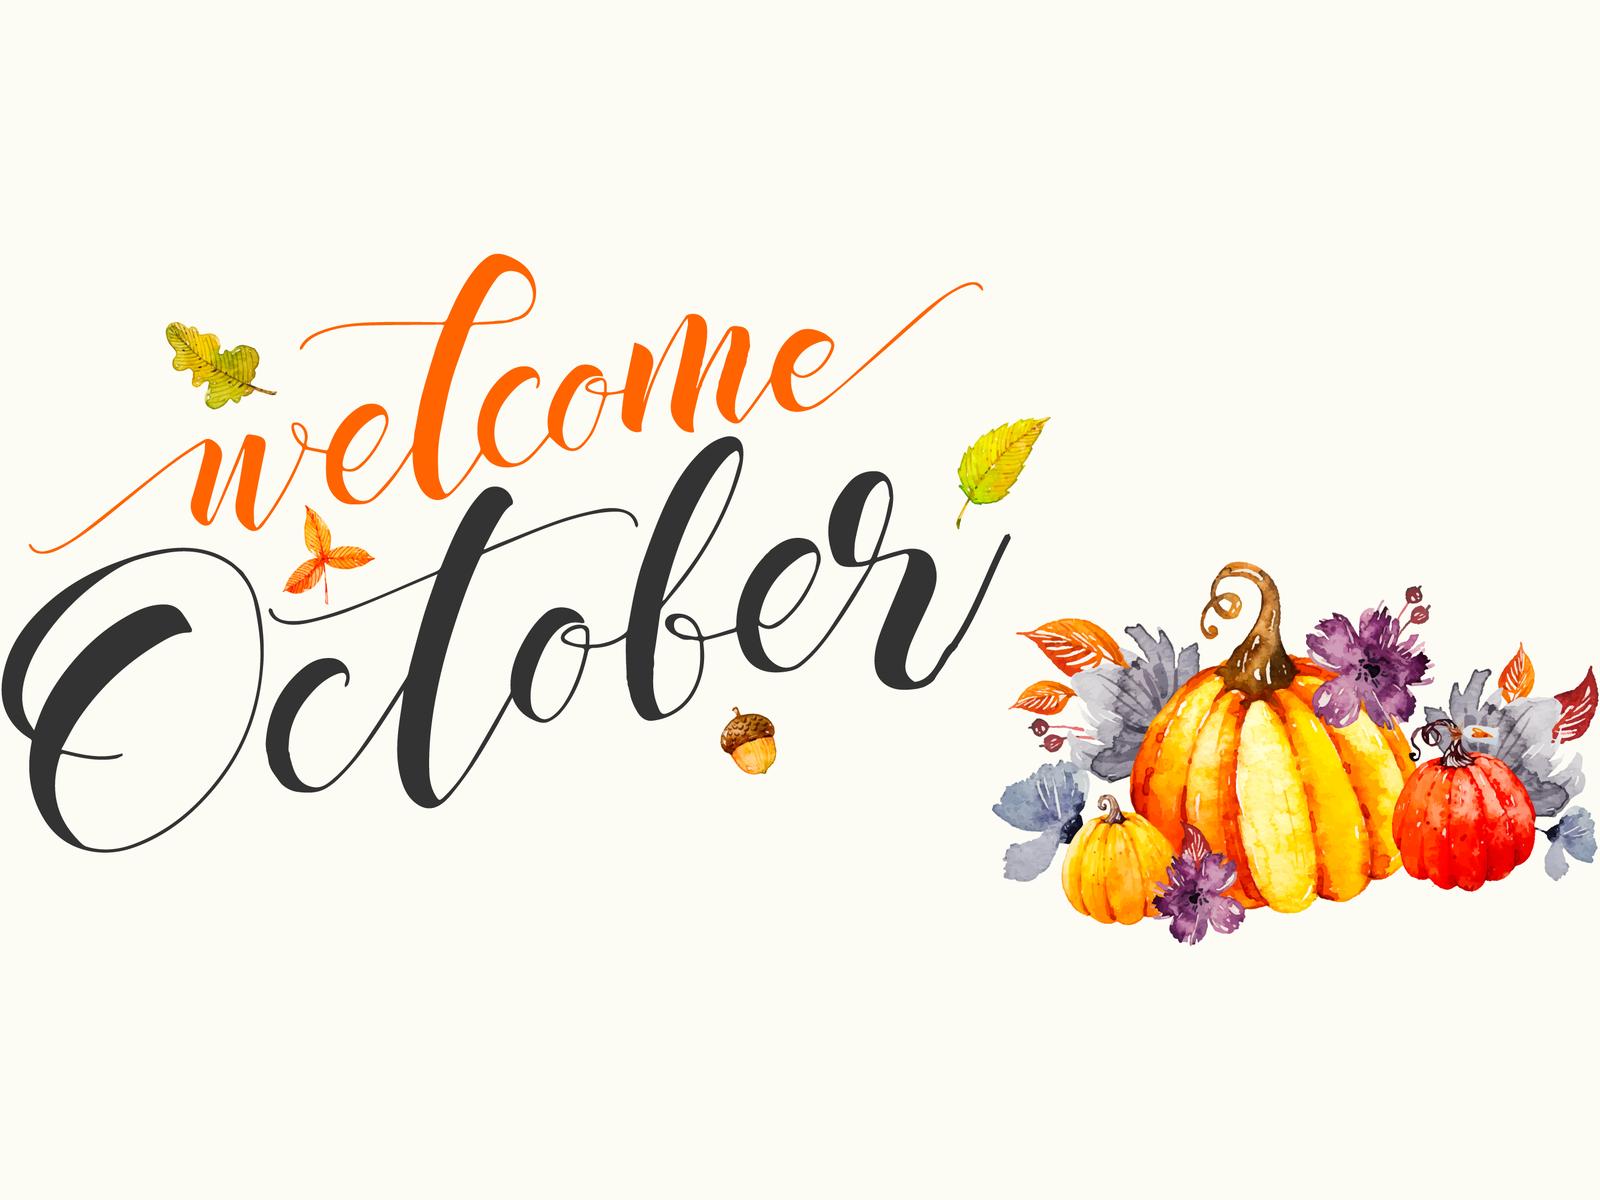 october_2018_cromatix_facebook_post_1_4x.png